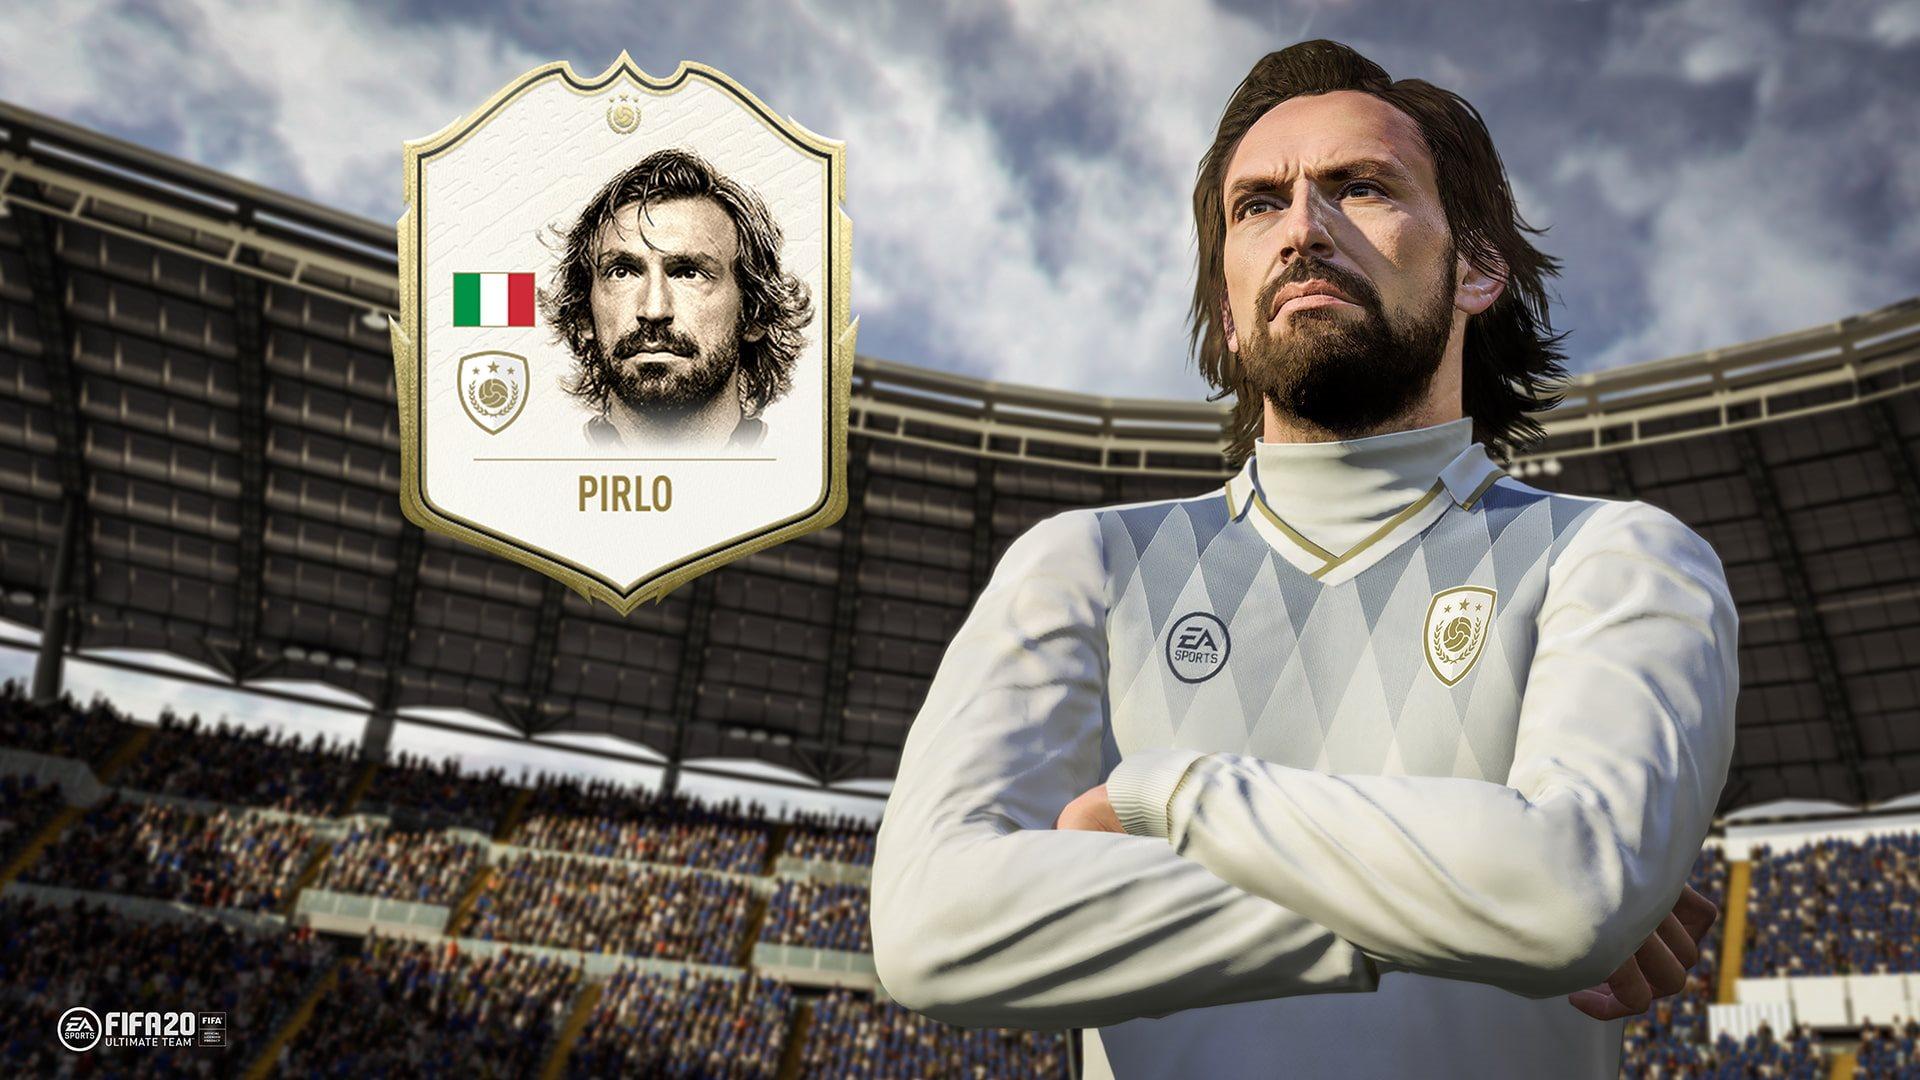 FIFA 20; screenshot: Pirlo